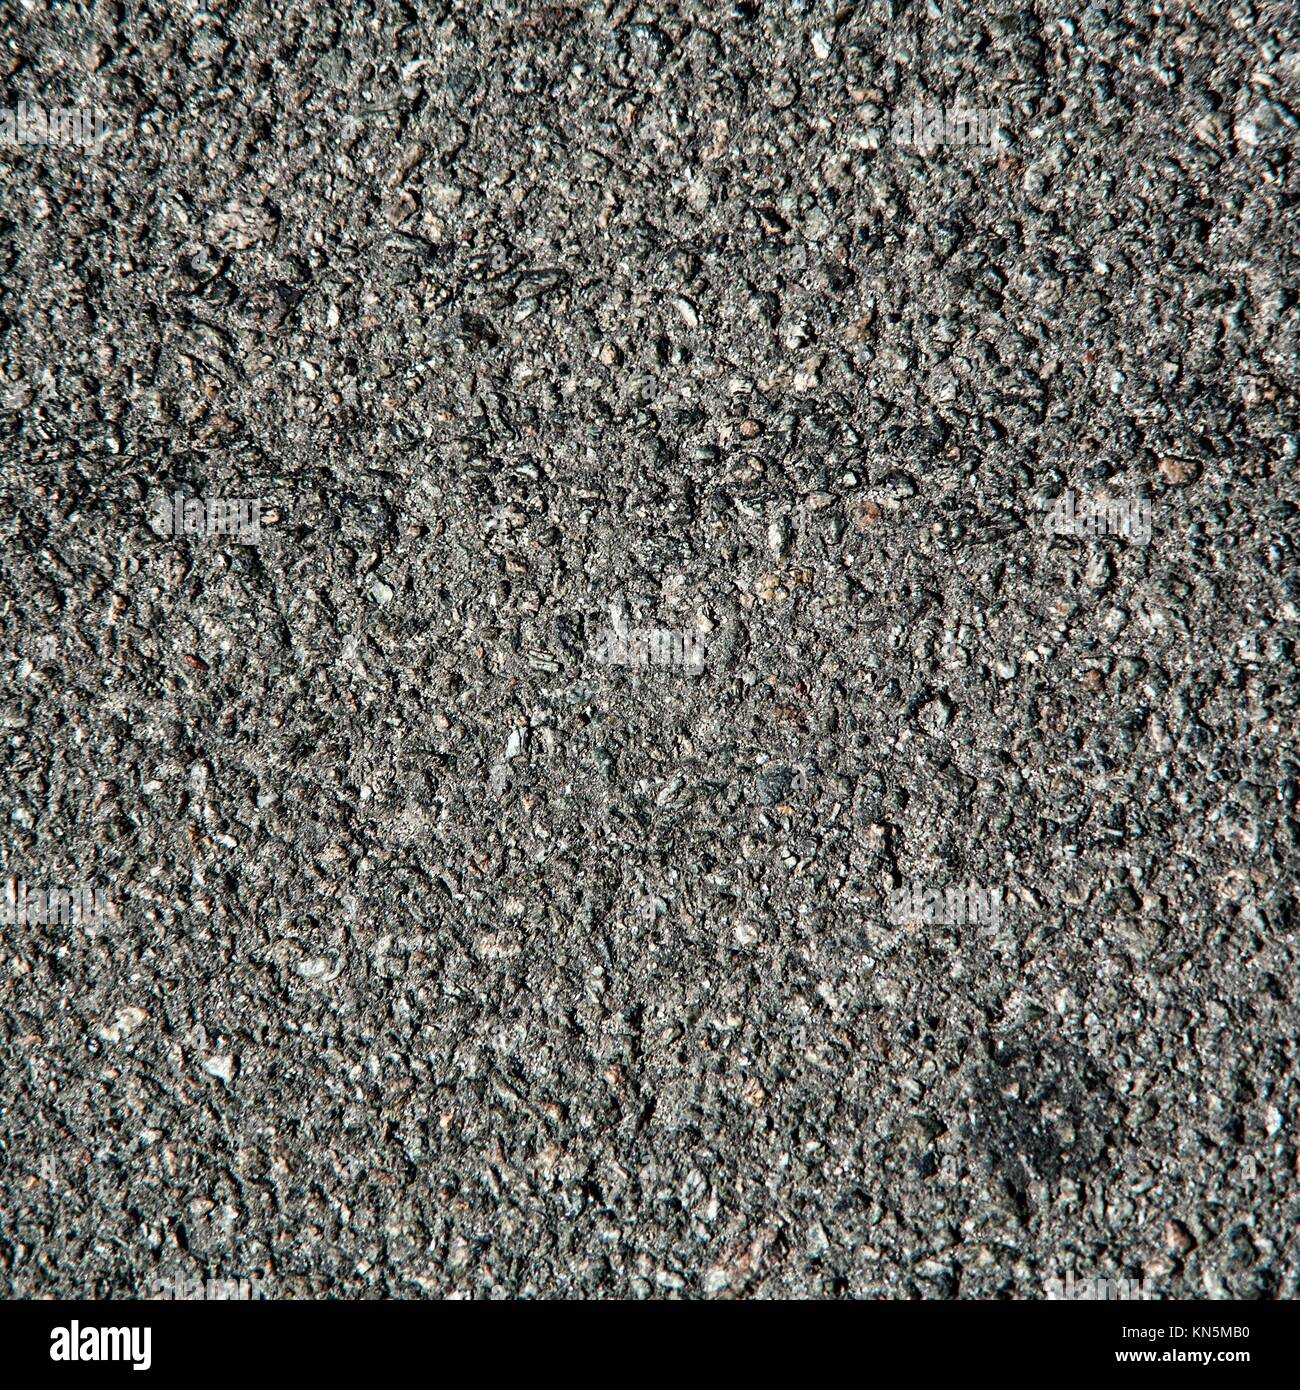 Asphalt texture background as your design element. - Stock Image